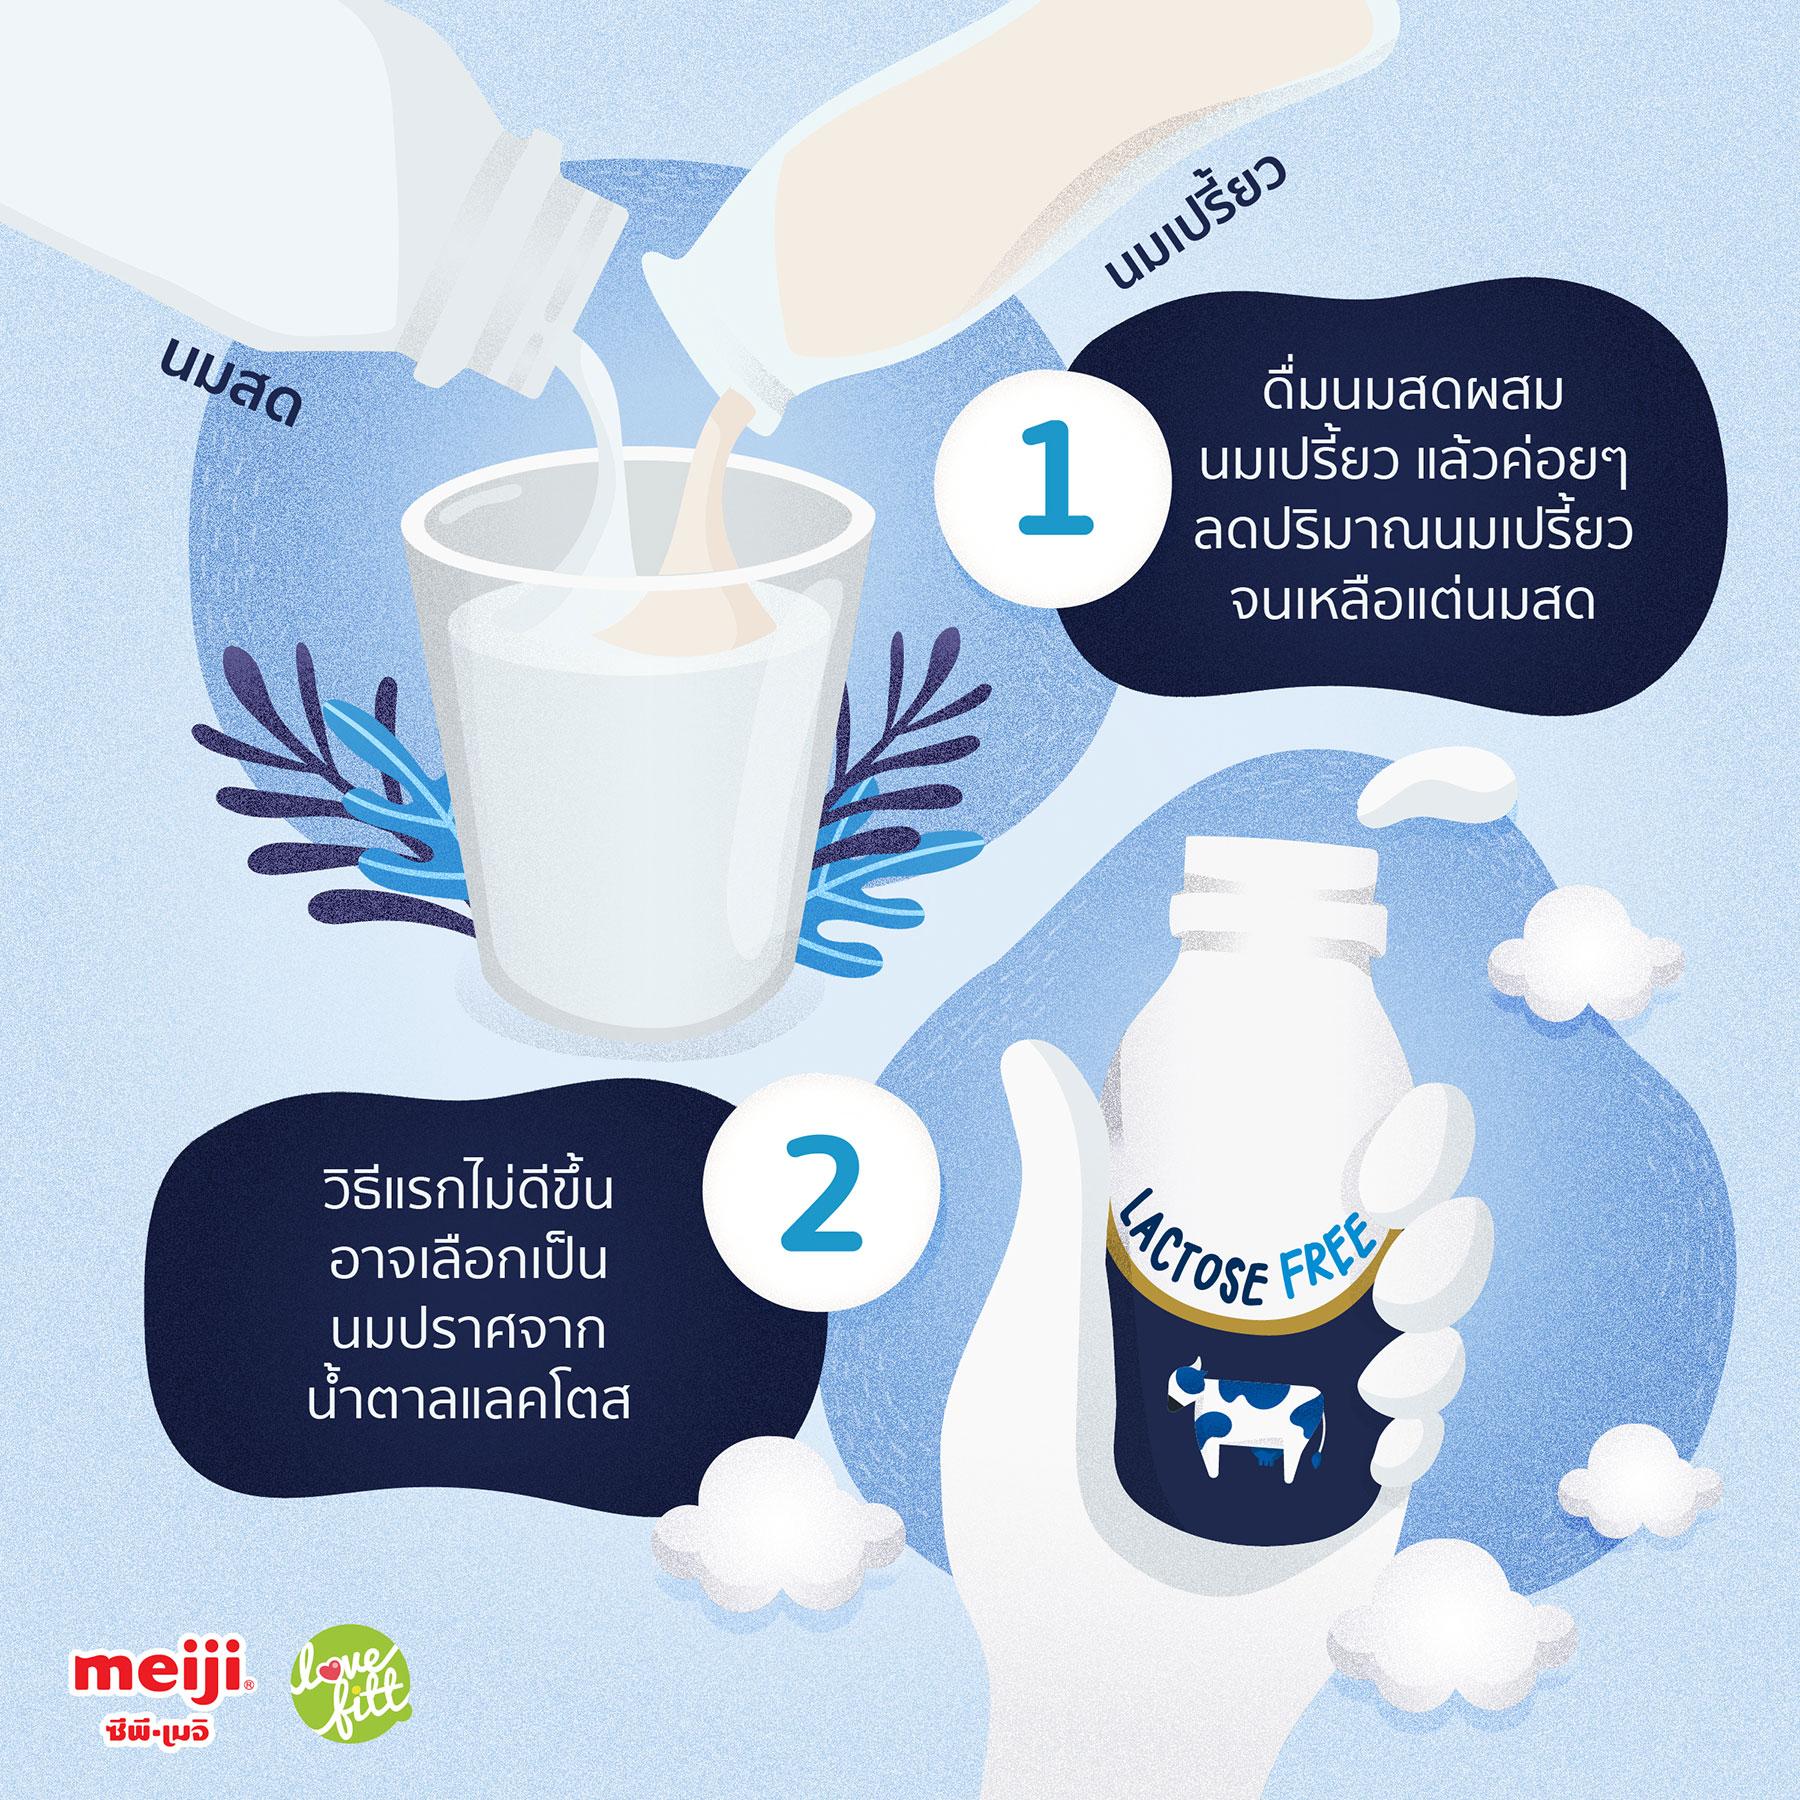 meiji-lactose-free-milk-img-06